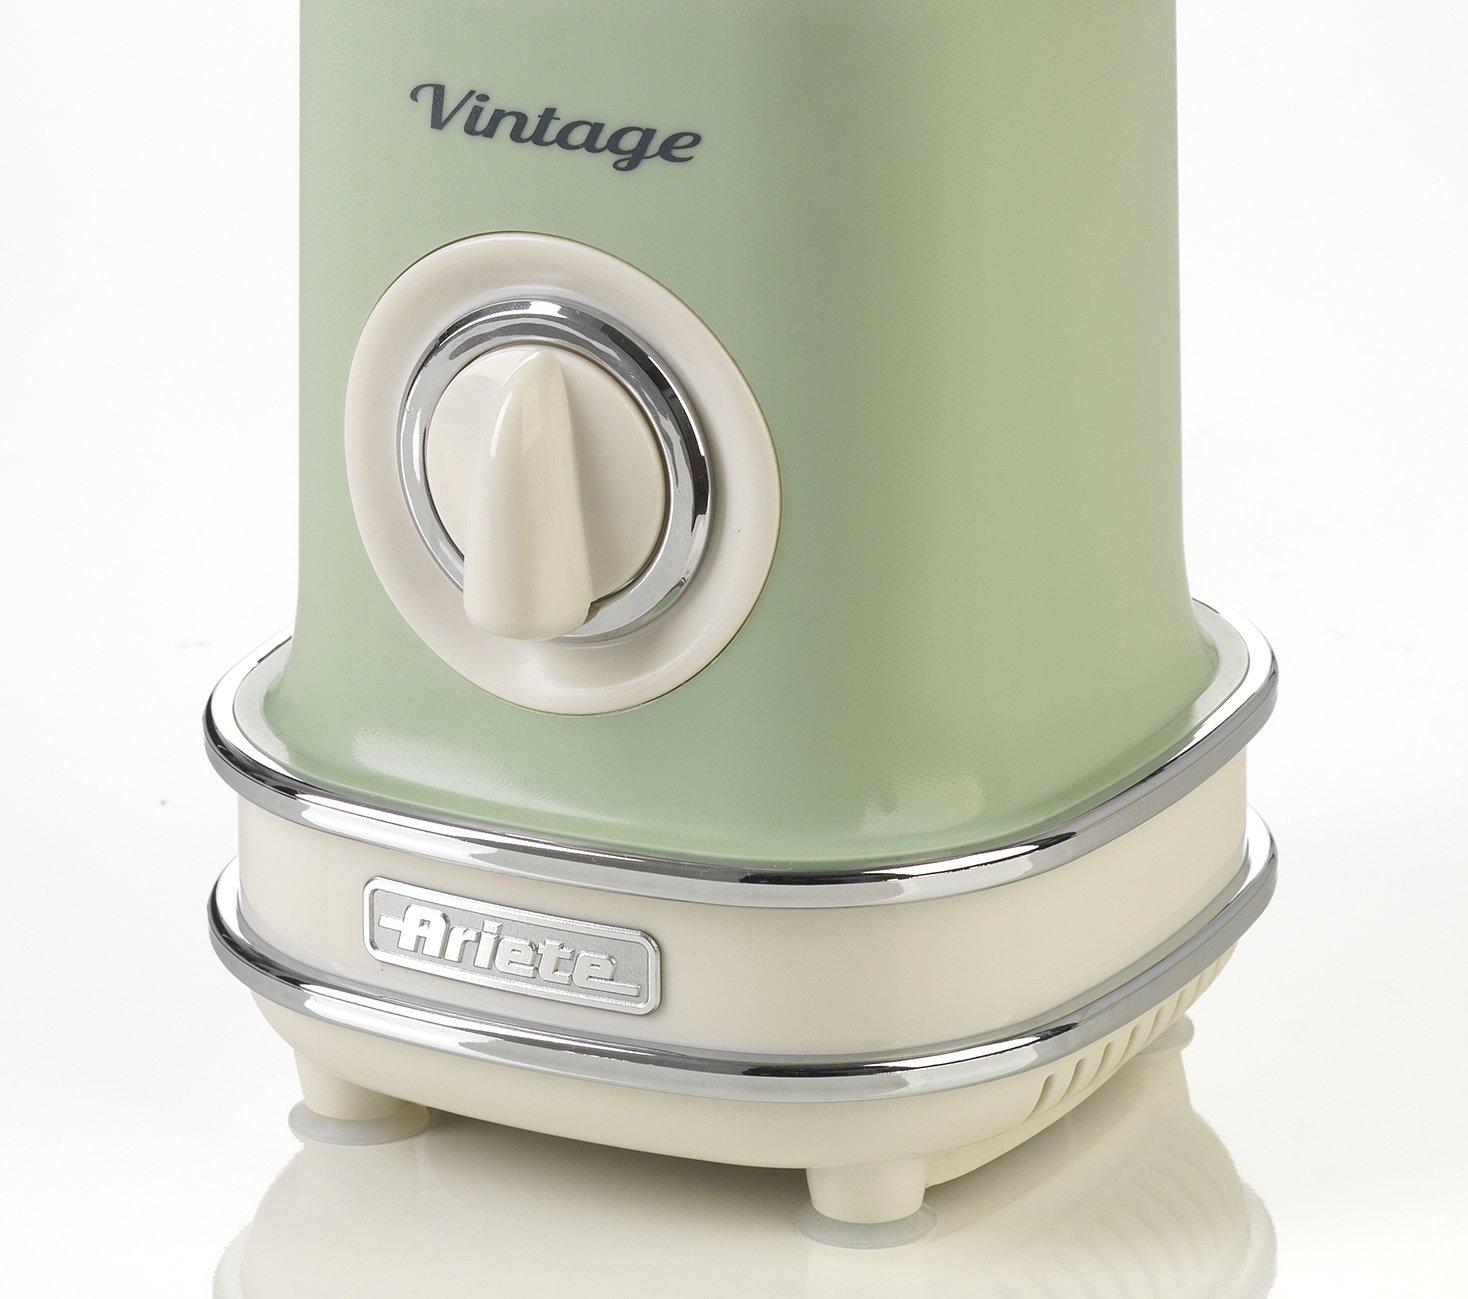 Ariete 568/04 Batidora de Vaso Vintage, 500 W, 1 Litro, 2 Velocidades, Verde